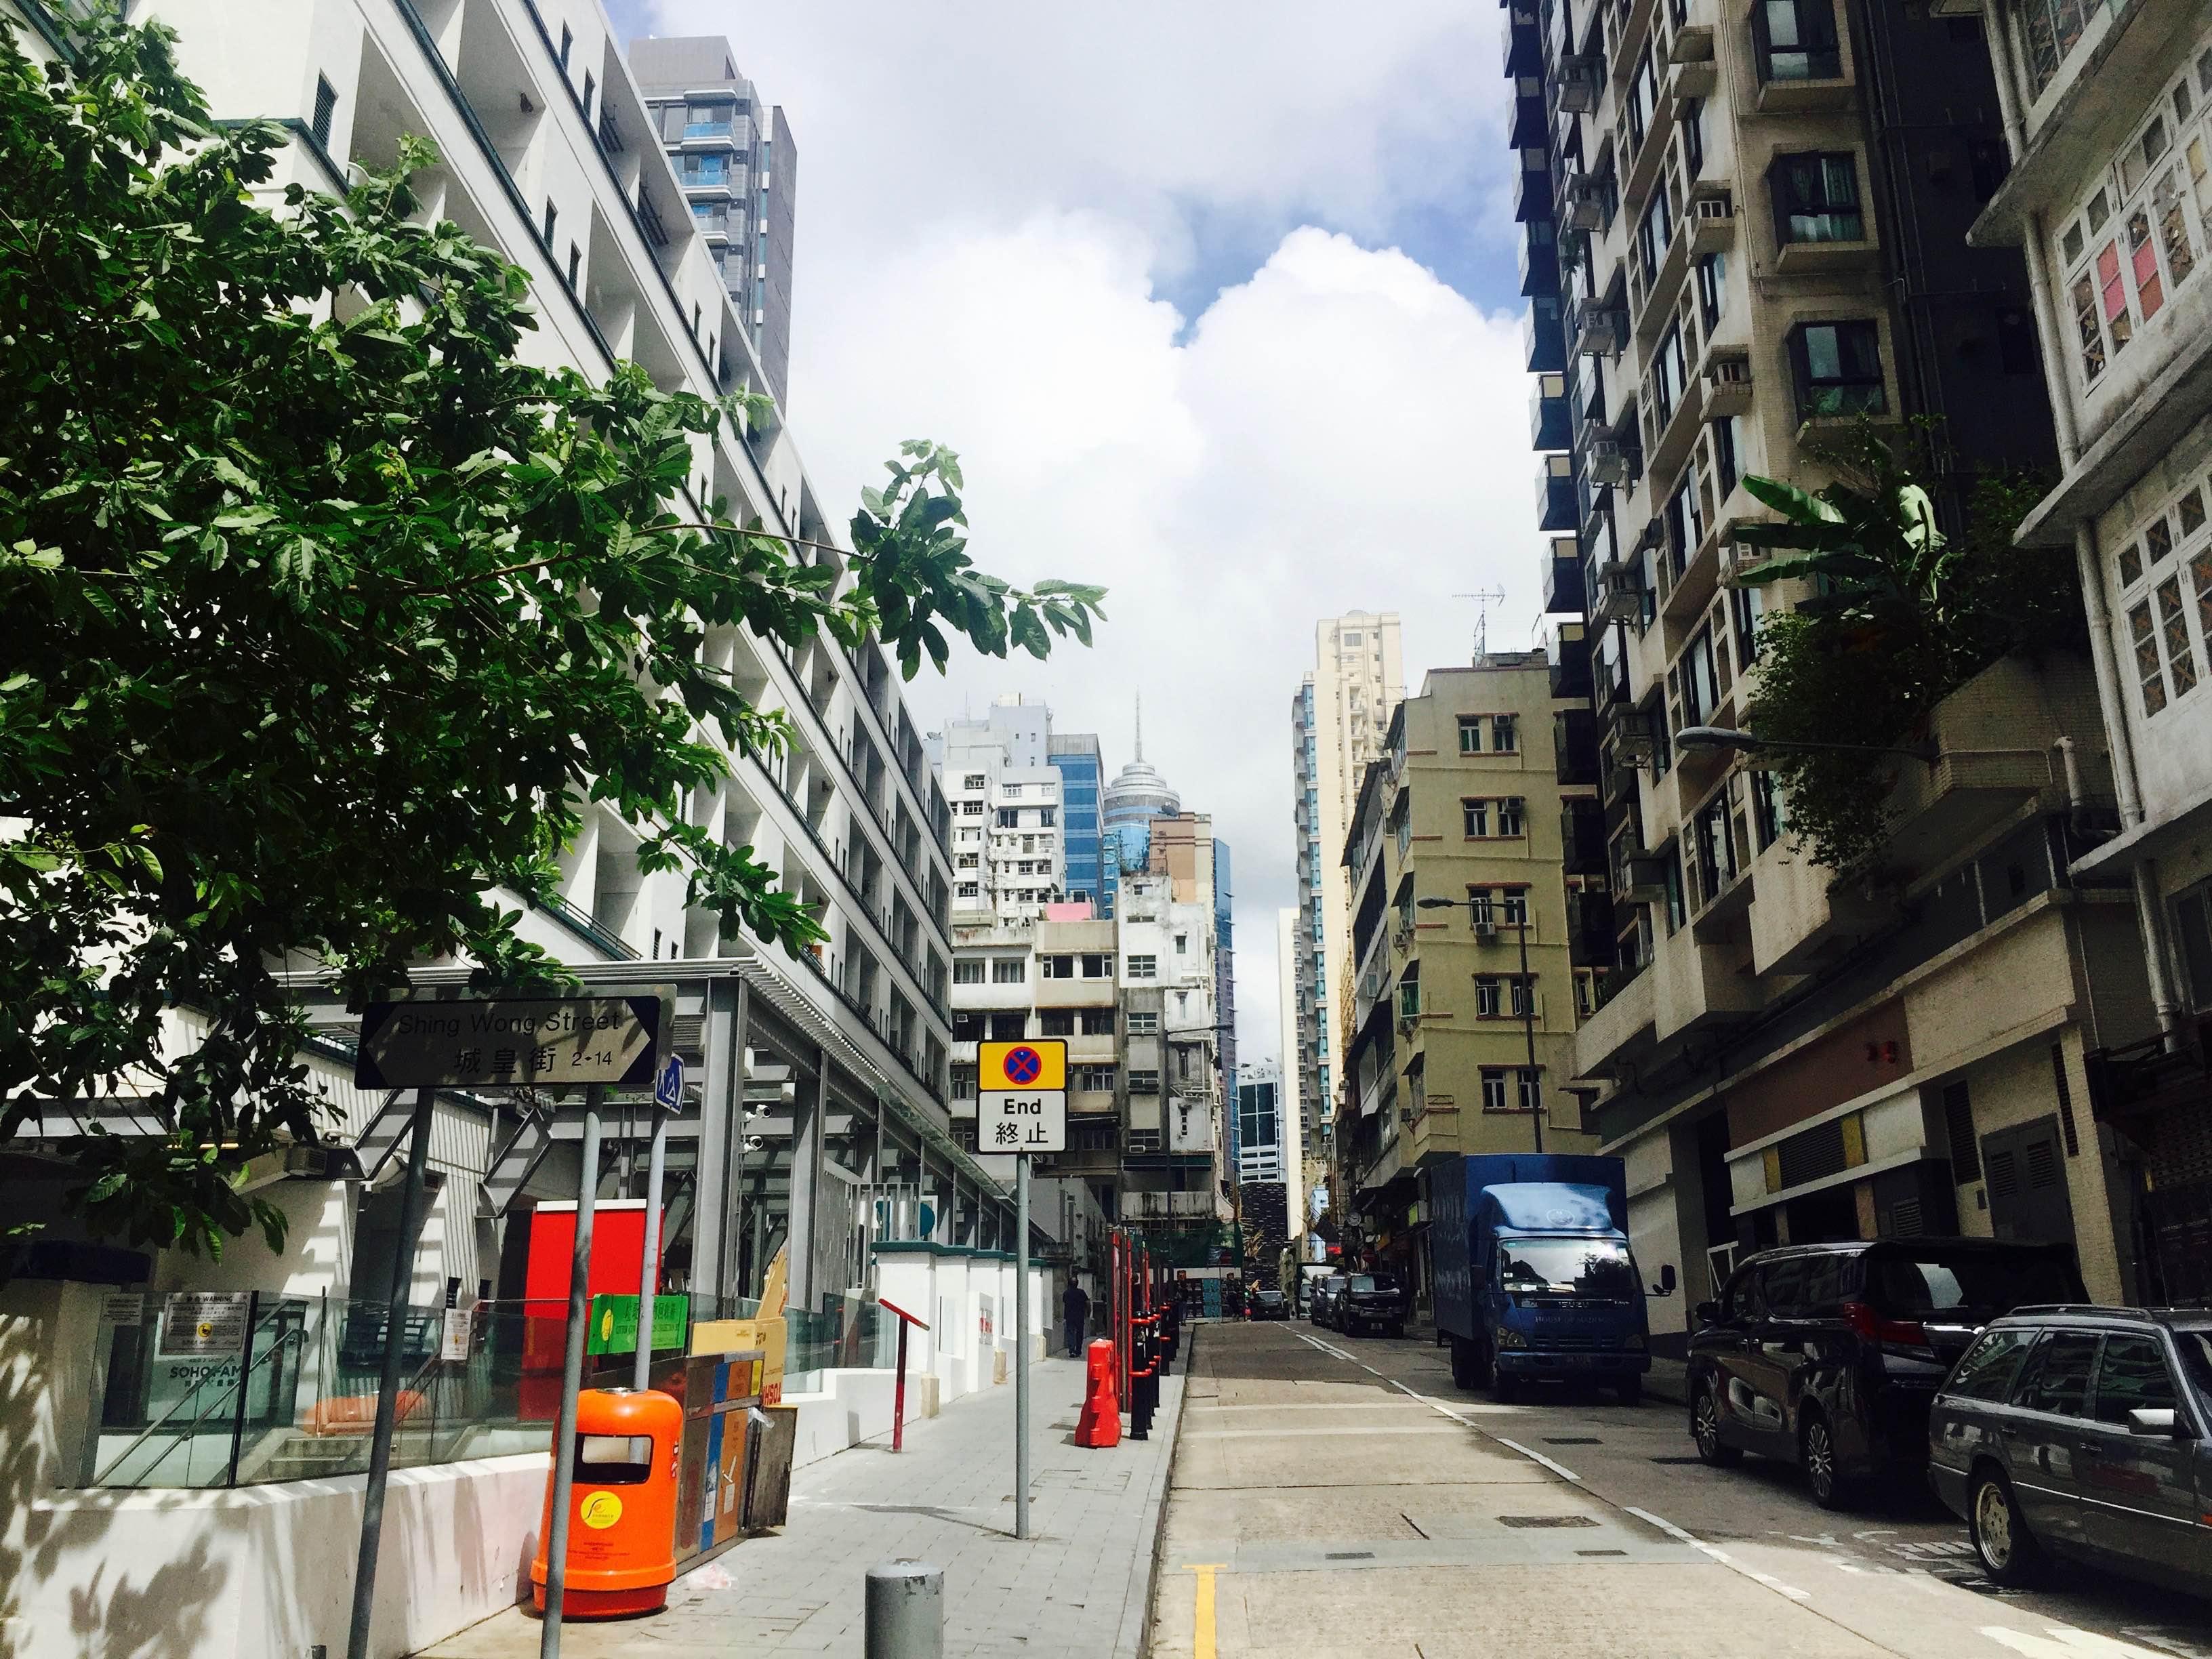 HK Bridges Street PMQ entrance HK few minutes walk to Soho Central